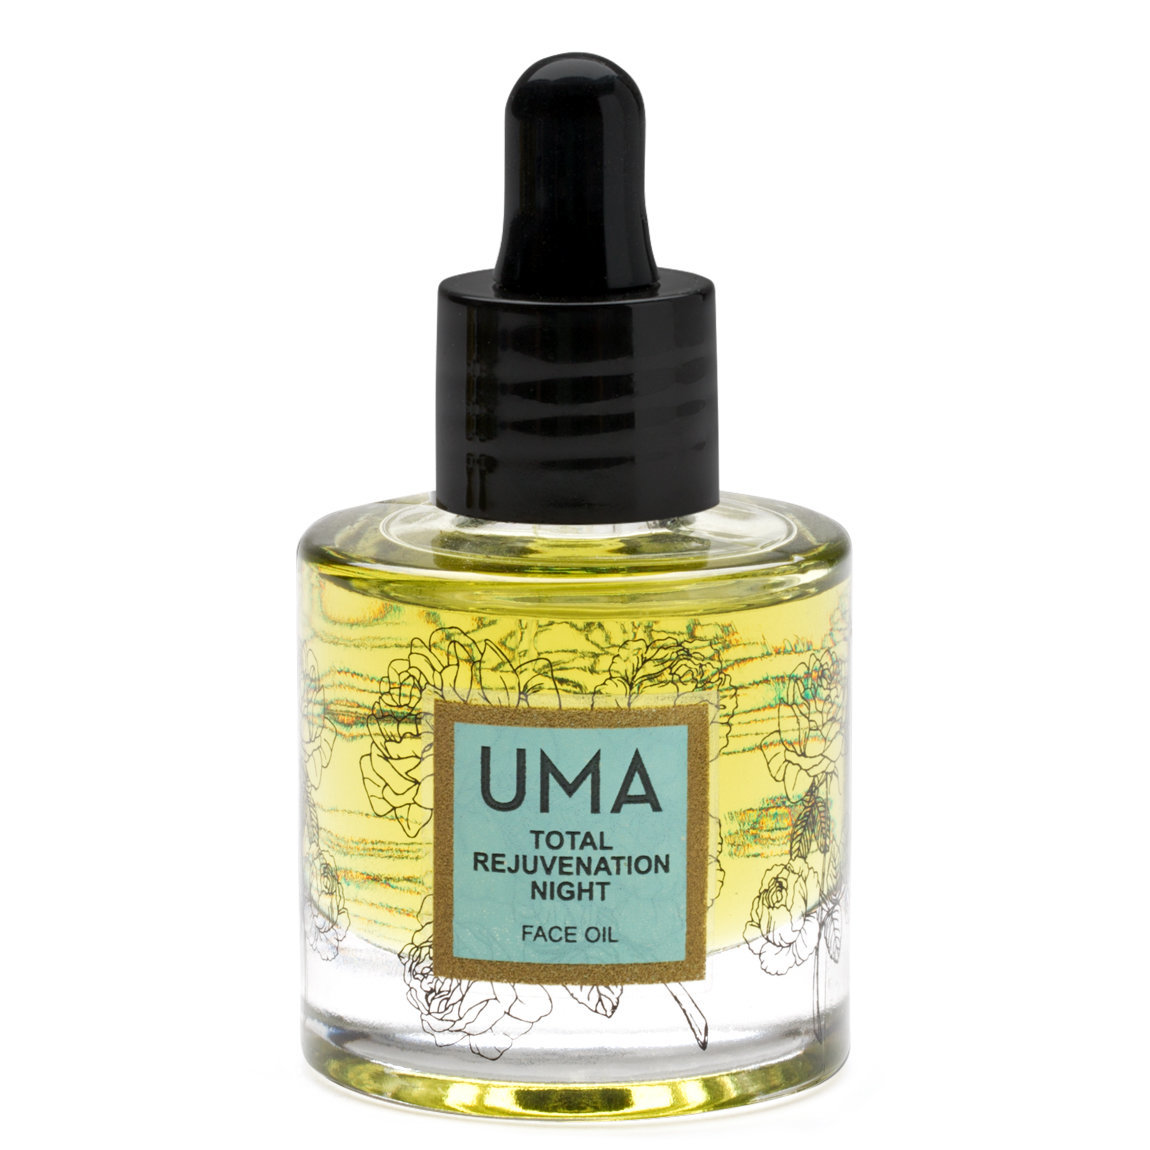 Uma Total Rejuvenation Night Face Oil product swatch.